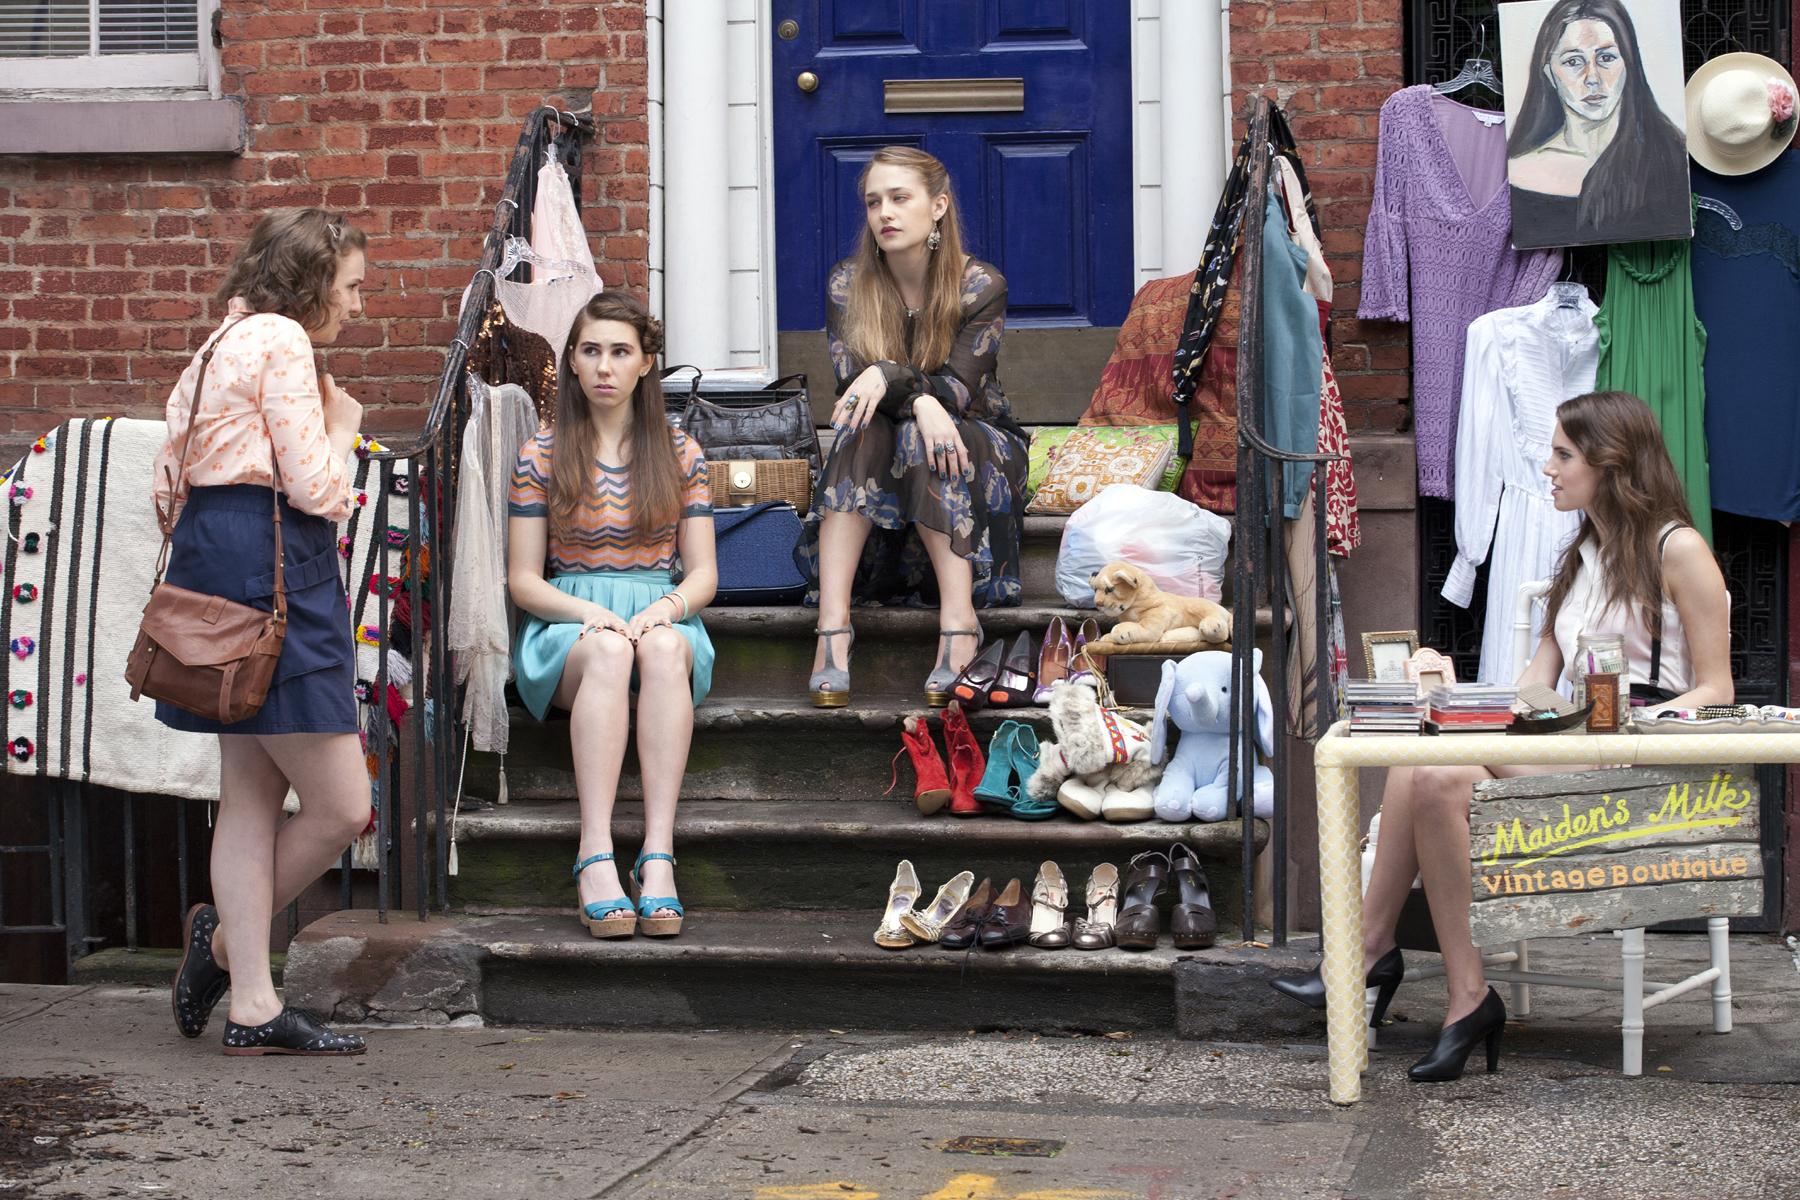 Zosia Mamet, Lena Dunham, Jemima Kirke, and Allison Williams in Girls (2012).